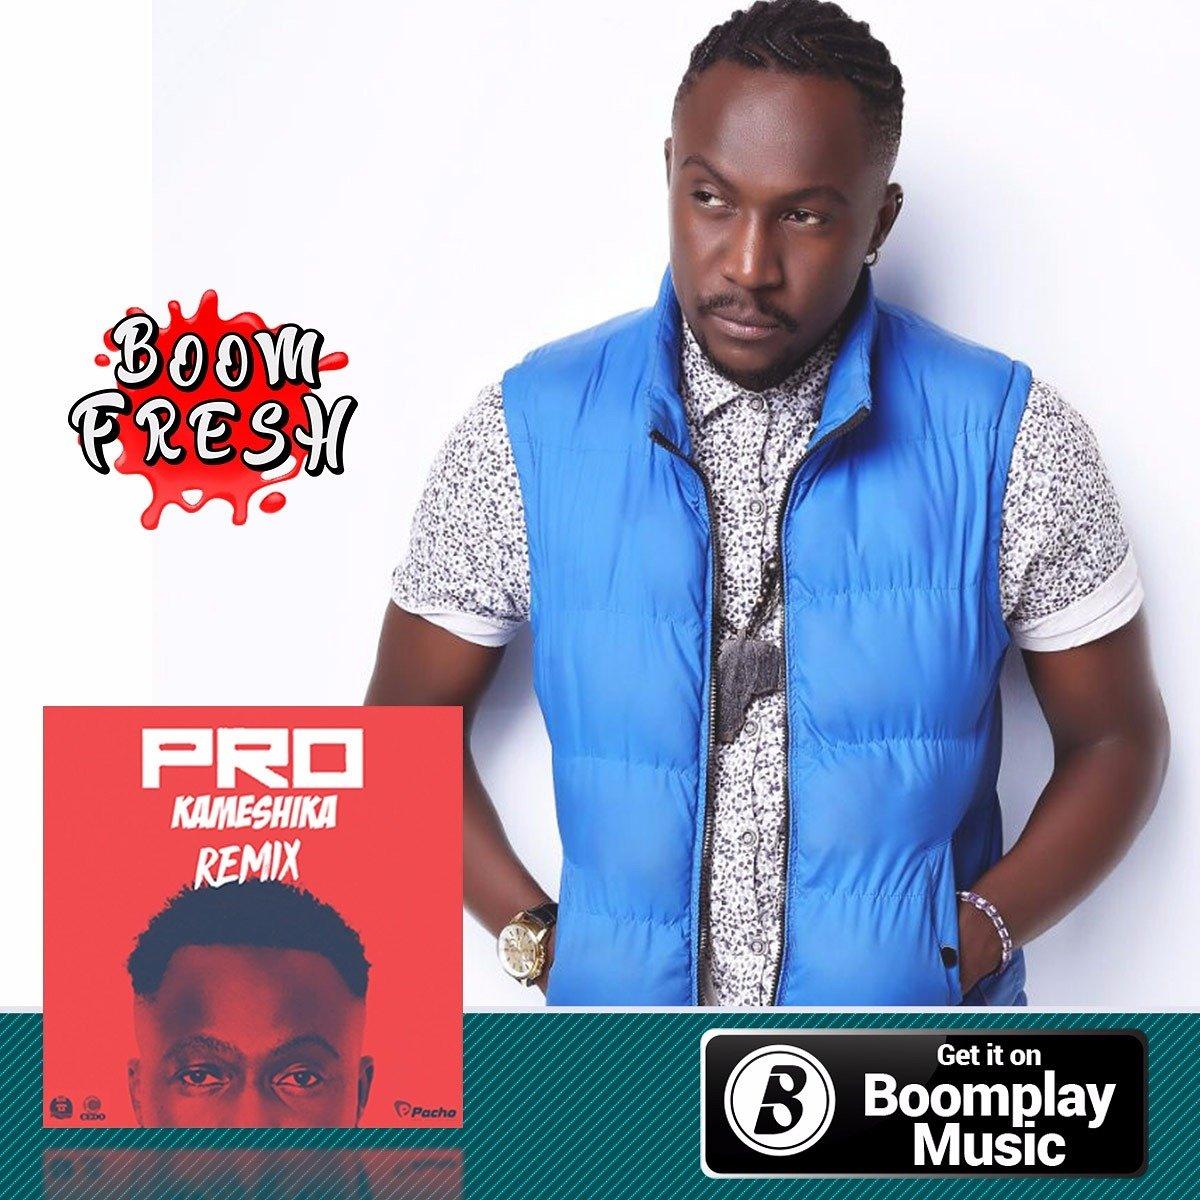 Get #KameshikaRemix by the one and only @iampro_kenya Right Here on #BoomplayMusic   Link   https:// goo.gl/5MMAqH  &nbsp;   Imeshika   #MusicDrop #NewMusicAlert<br>http://pic.twitter.com/26cE20cJsE